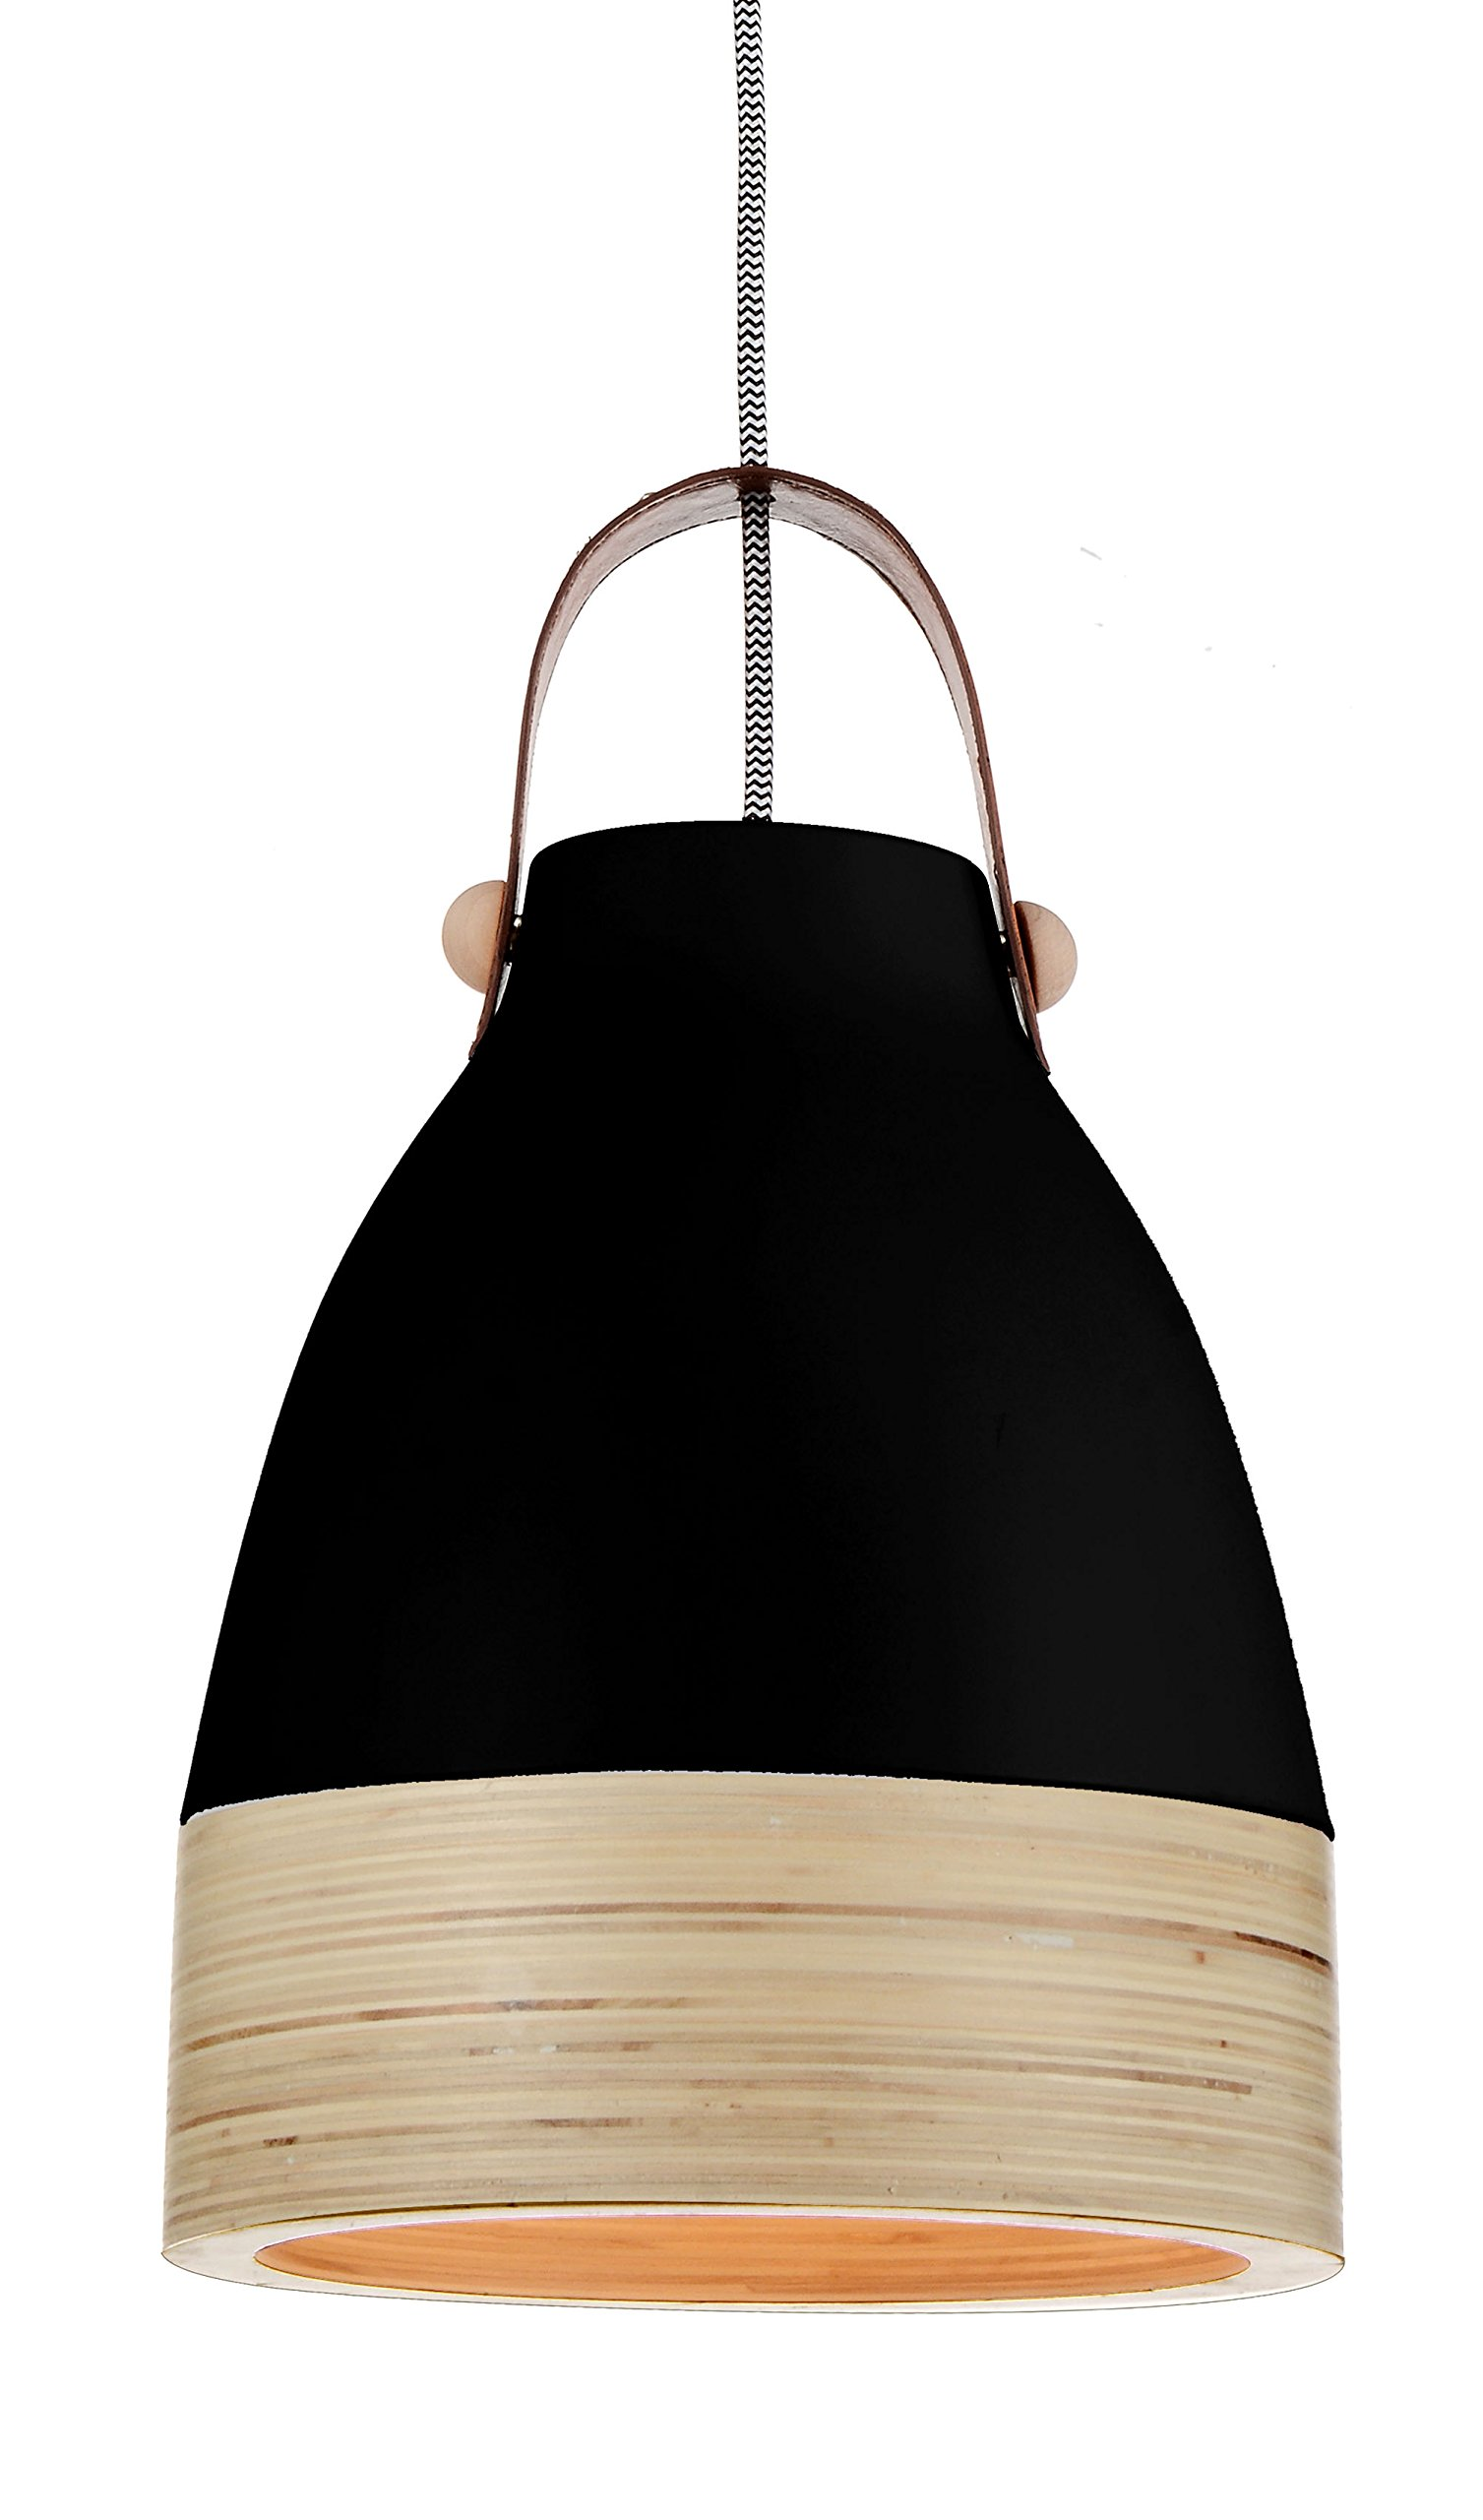 Cocoweb 9'' Norcia Pendant Light Black Shade with Wood Trim | LED Light Bulb Included | GO-C400-9BK